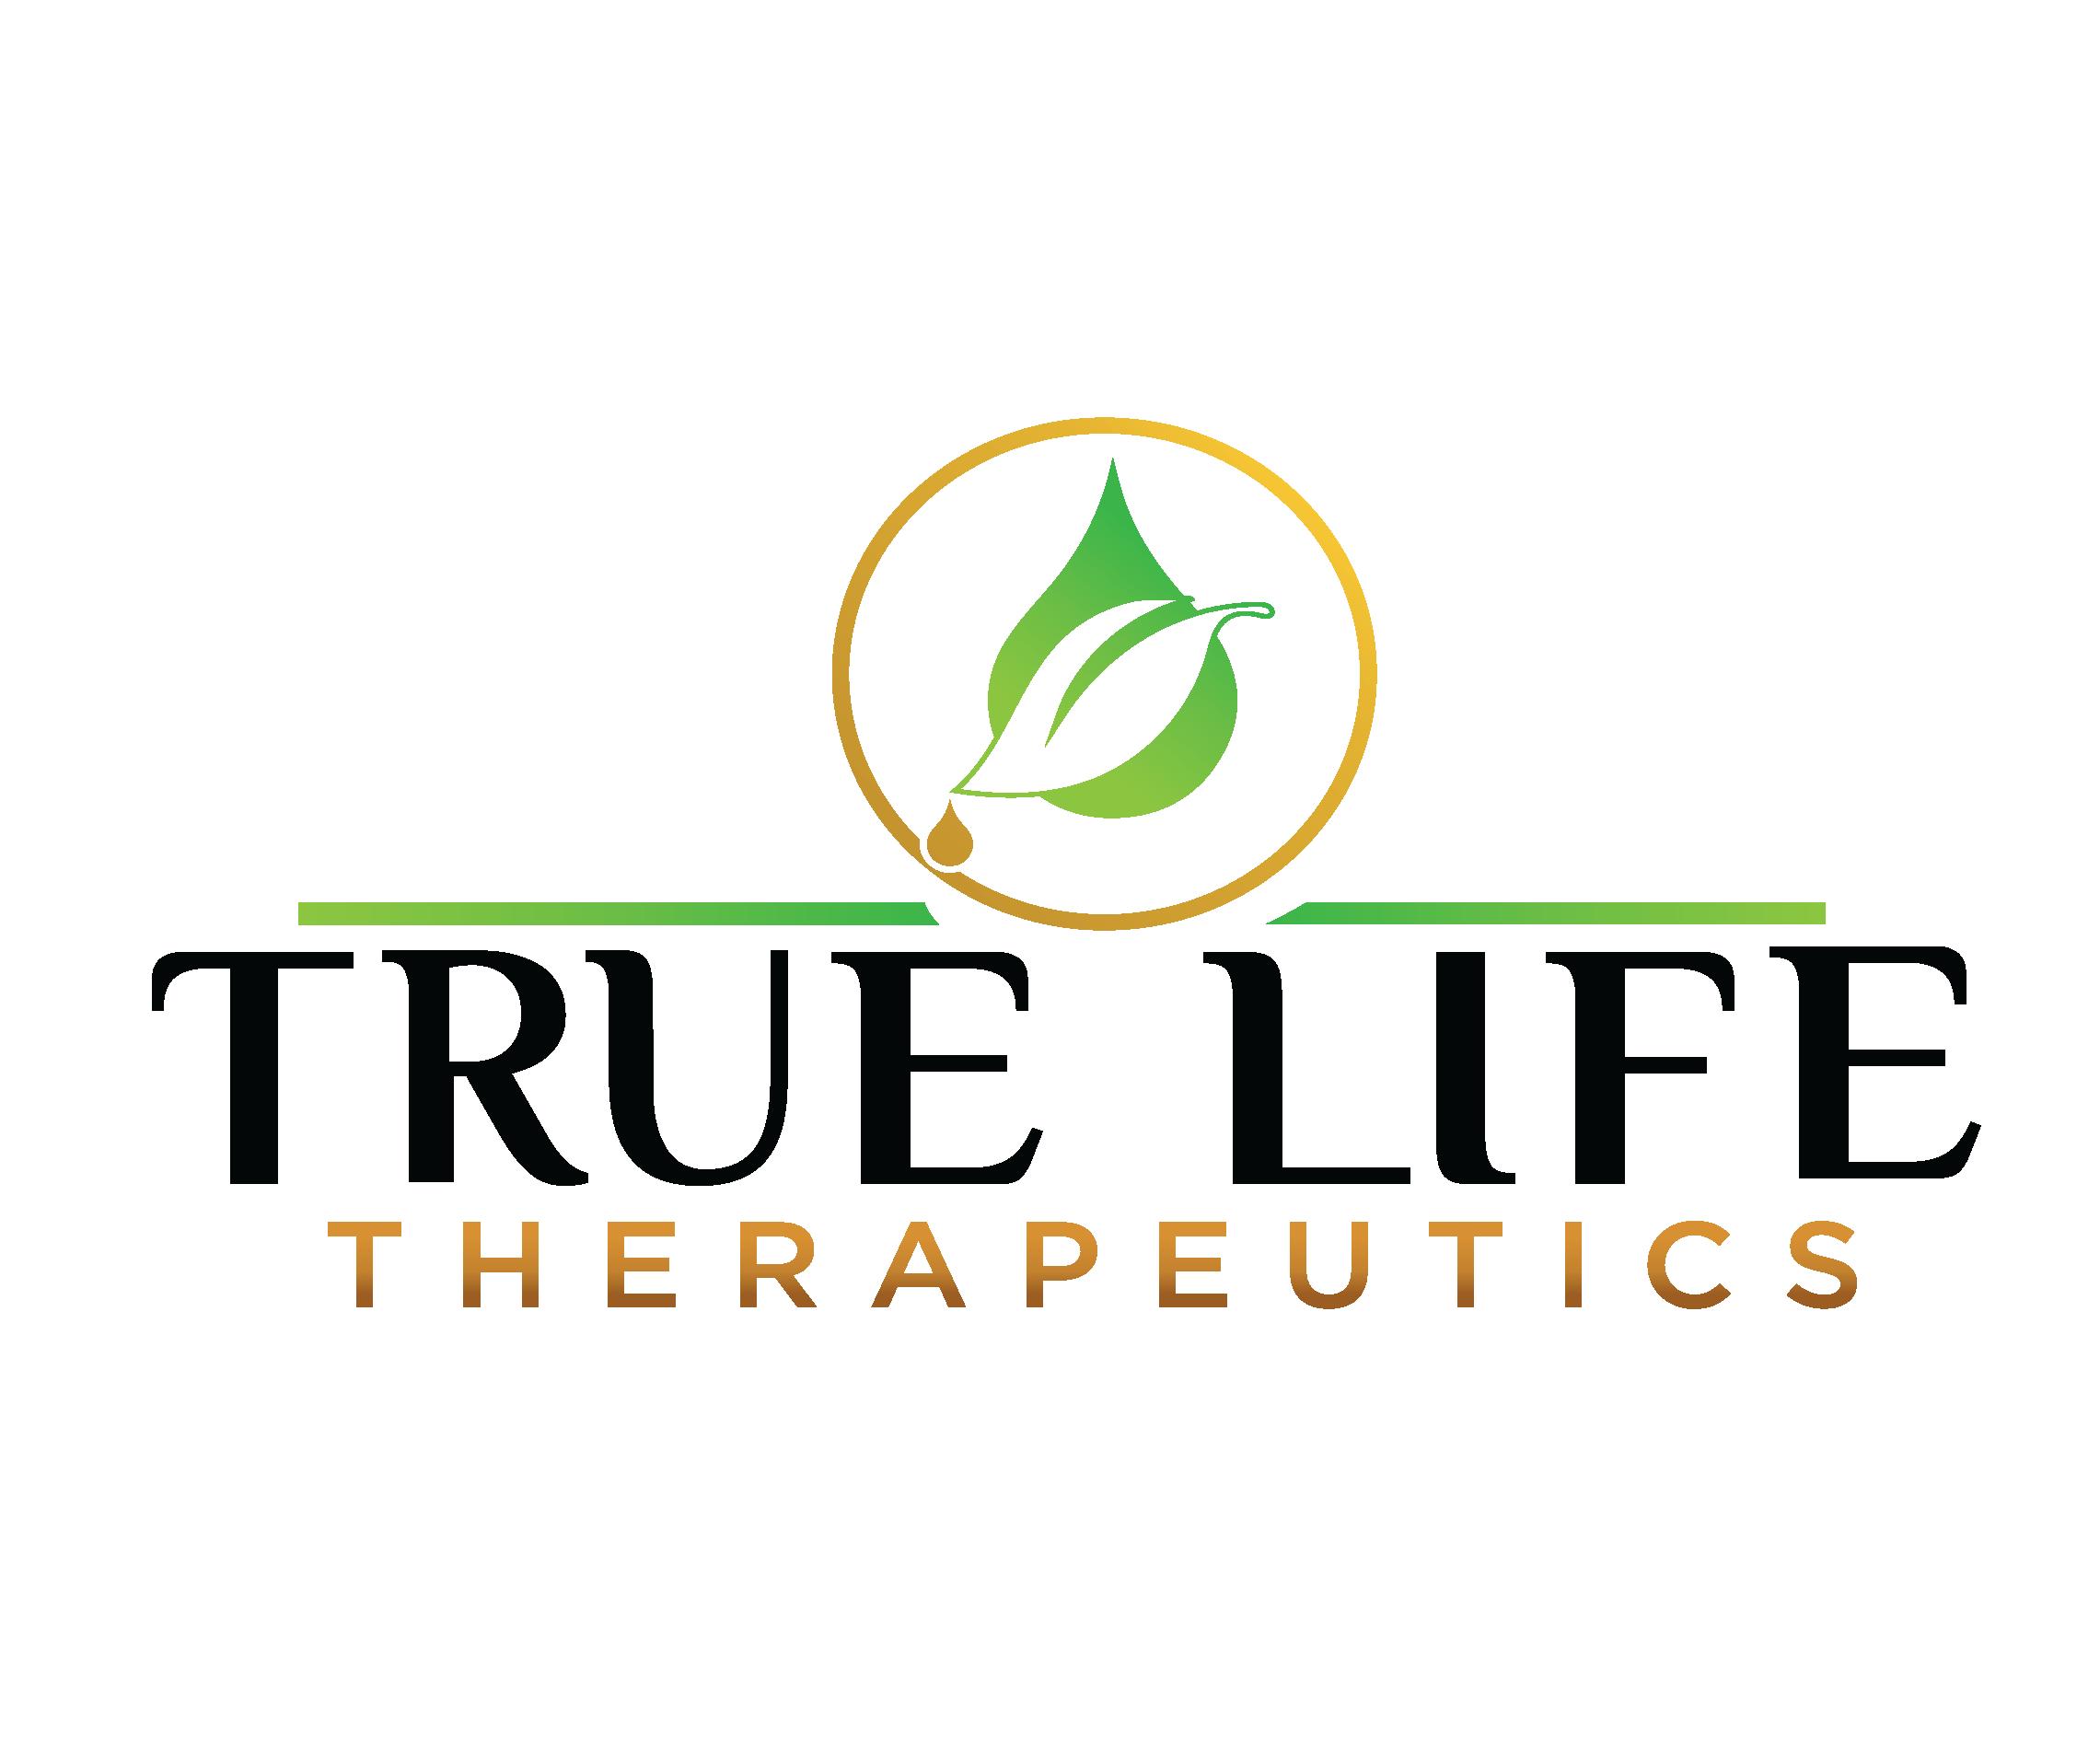 True Life Therapeutics